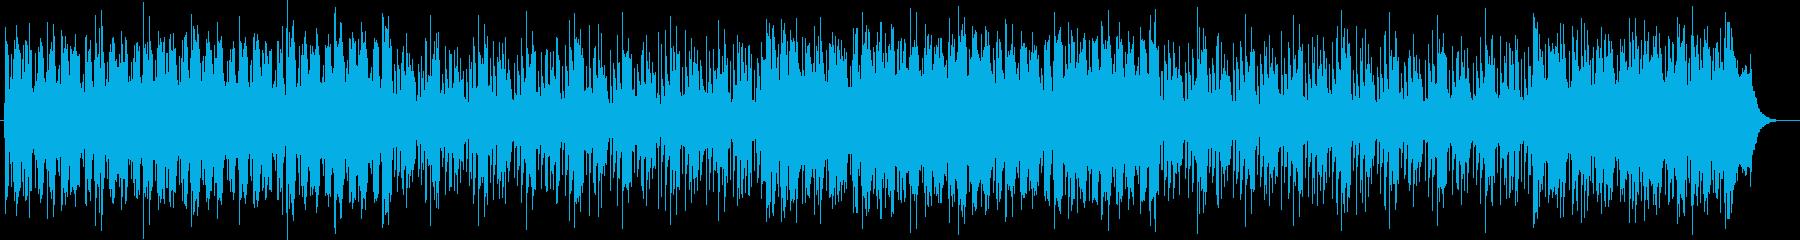 Near future wonder pops's reproduced waveform